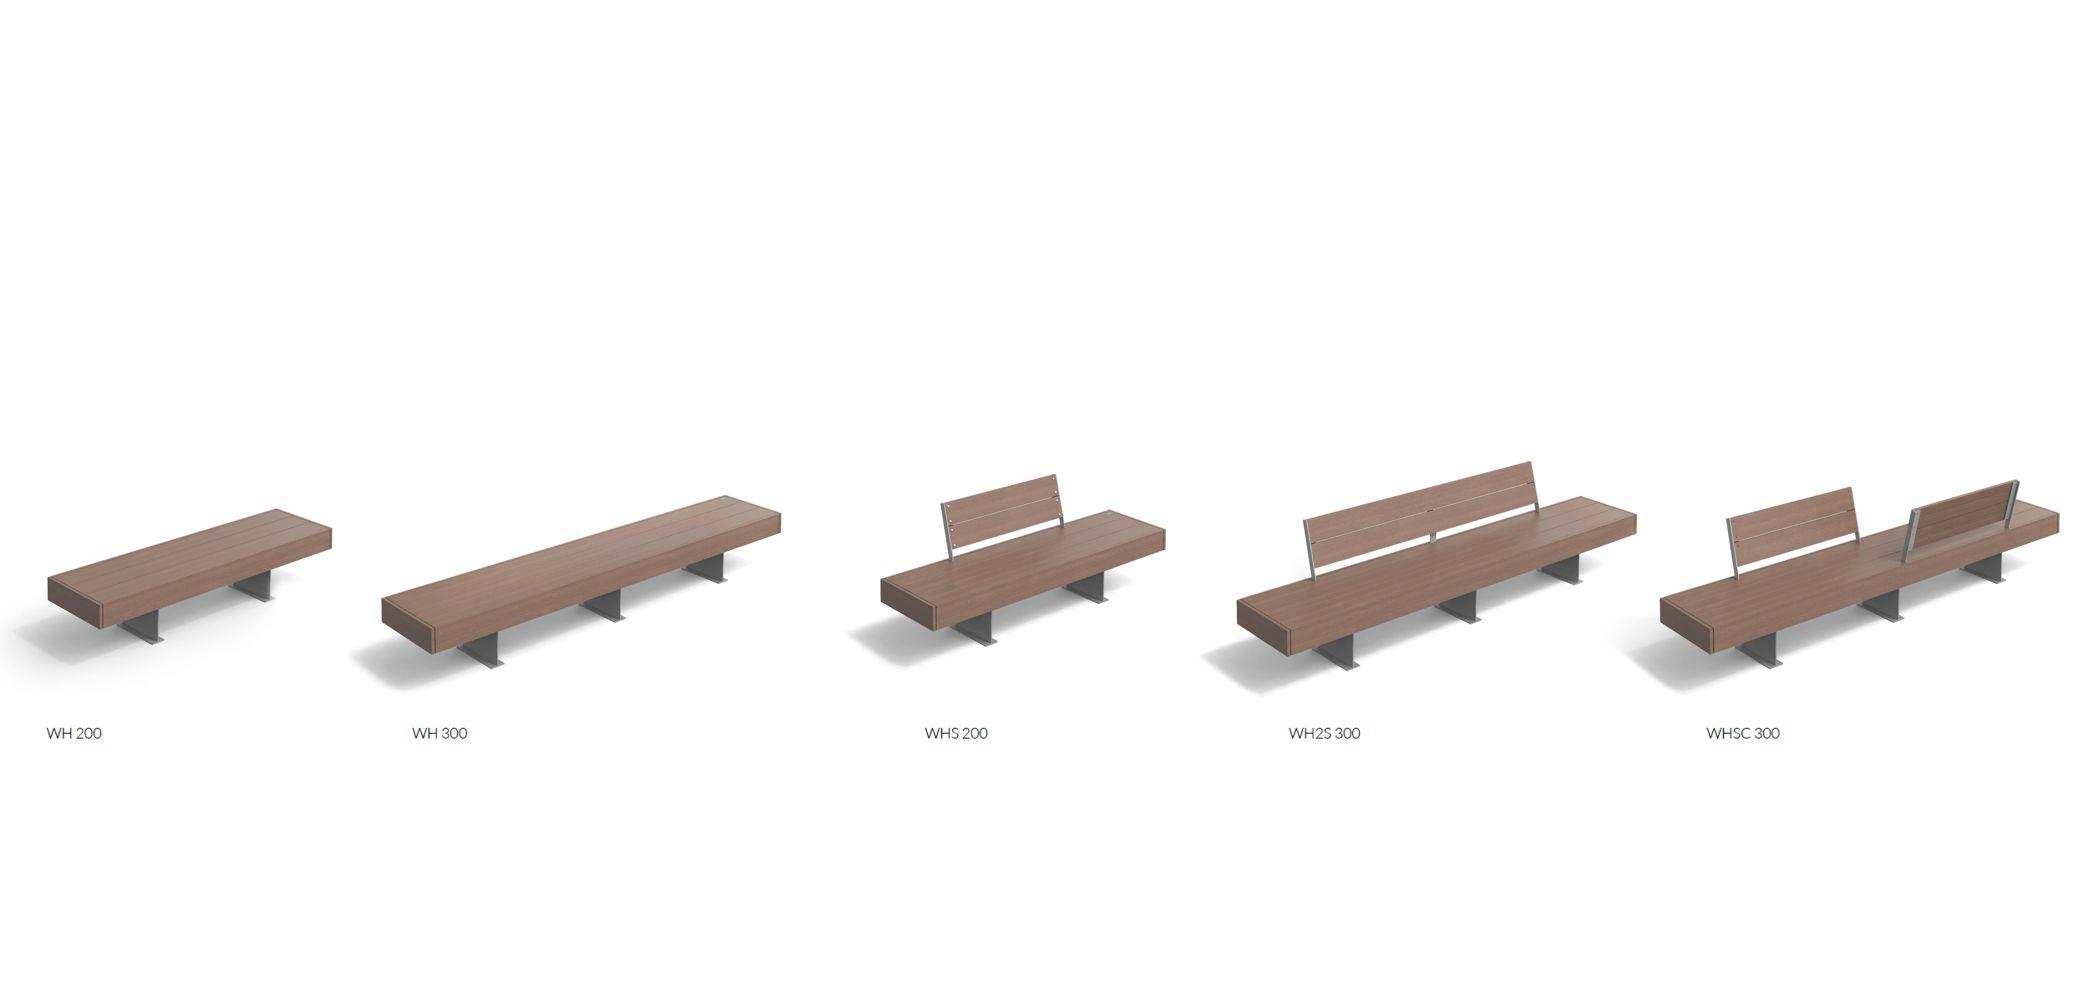 HARRIS WPC COLLECTION MODULAR SEATS